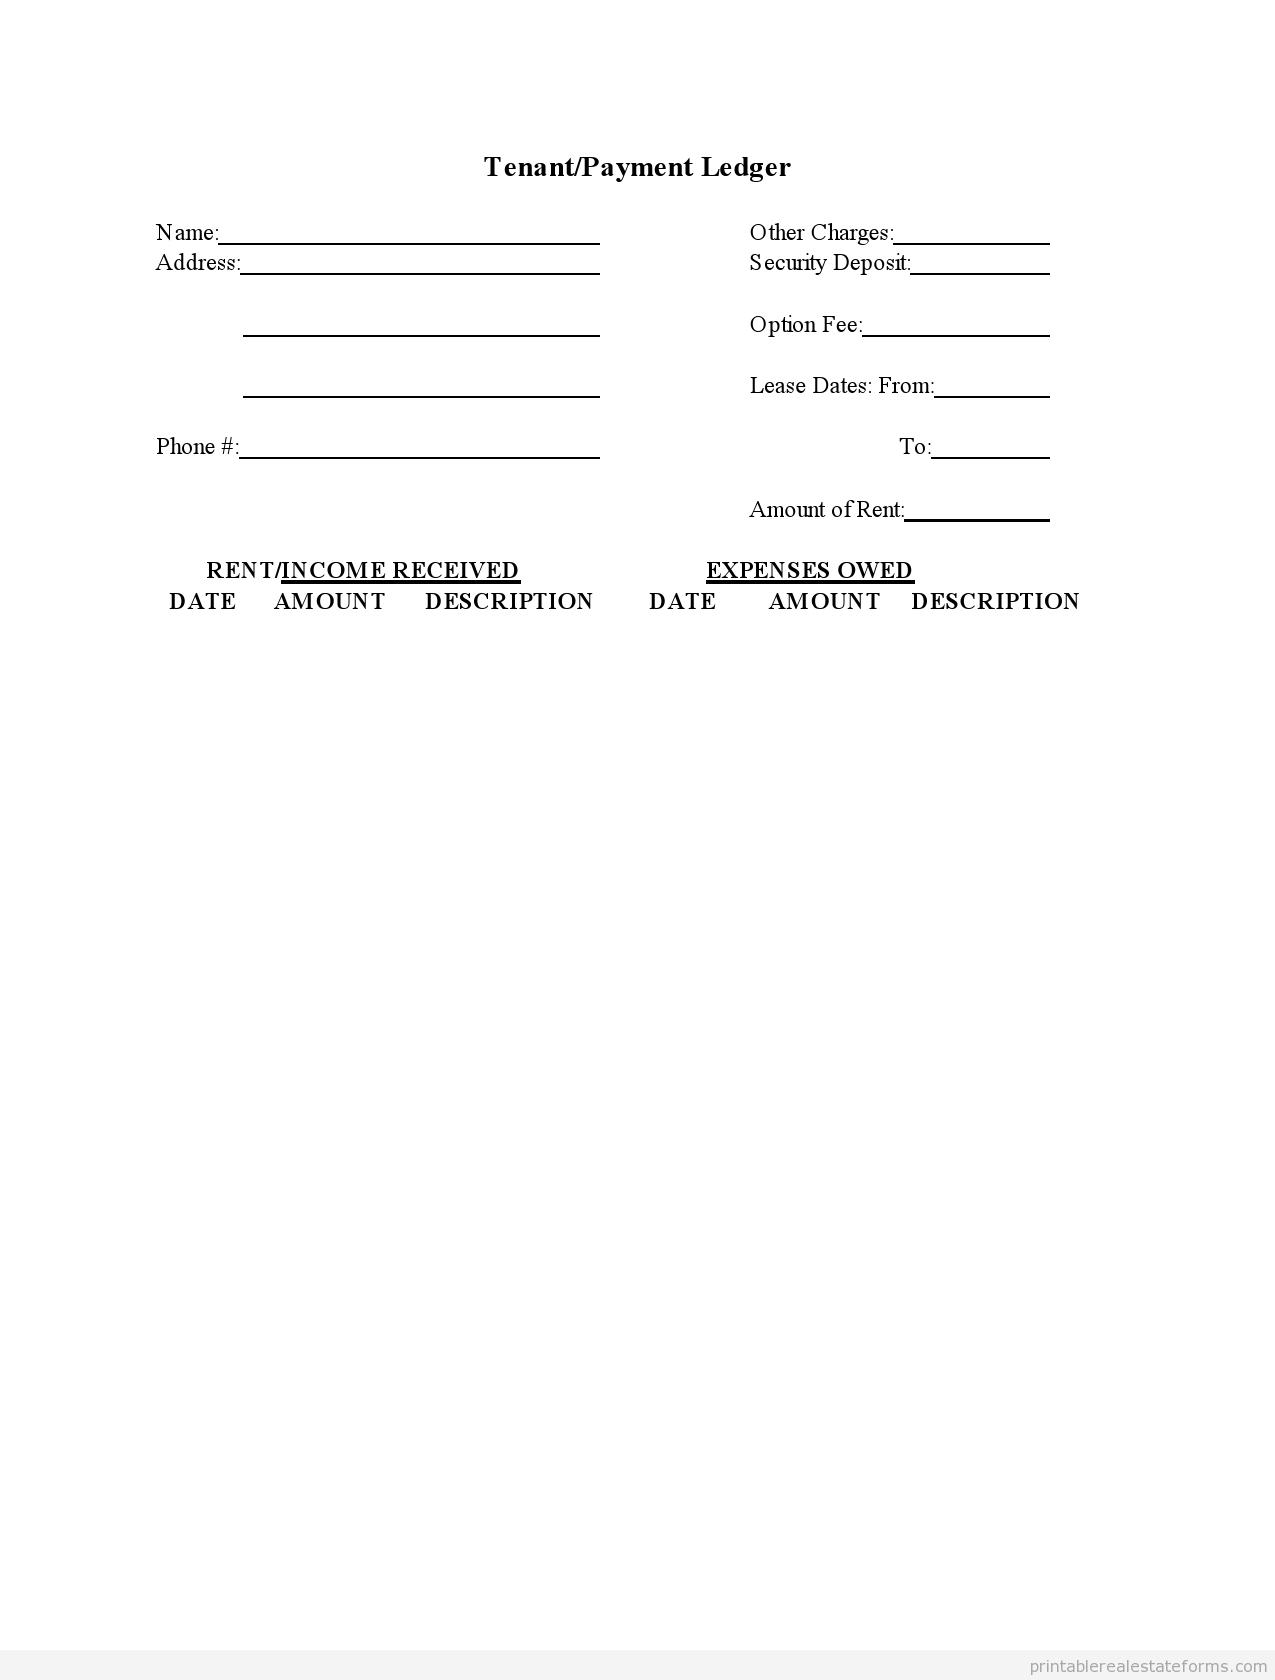 Sample Printable Tenant Payment Ledger Form   Sample Real Estate - Free Printable Rent Ledger